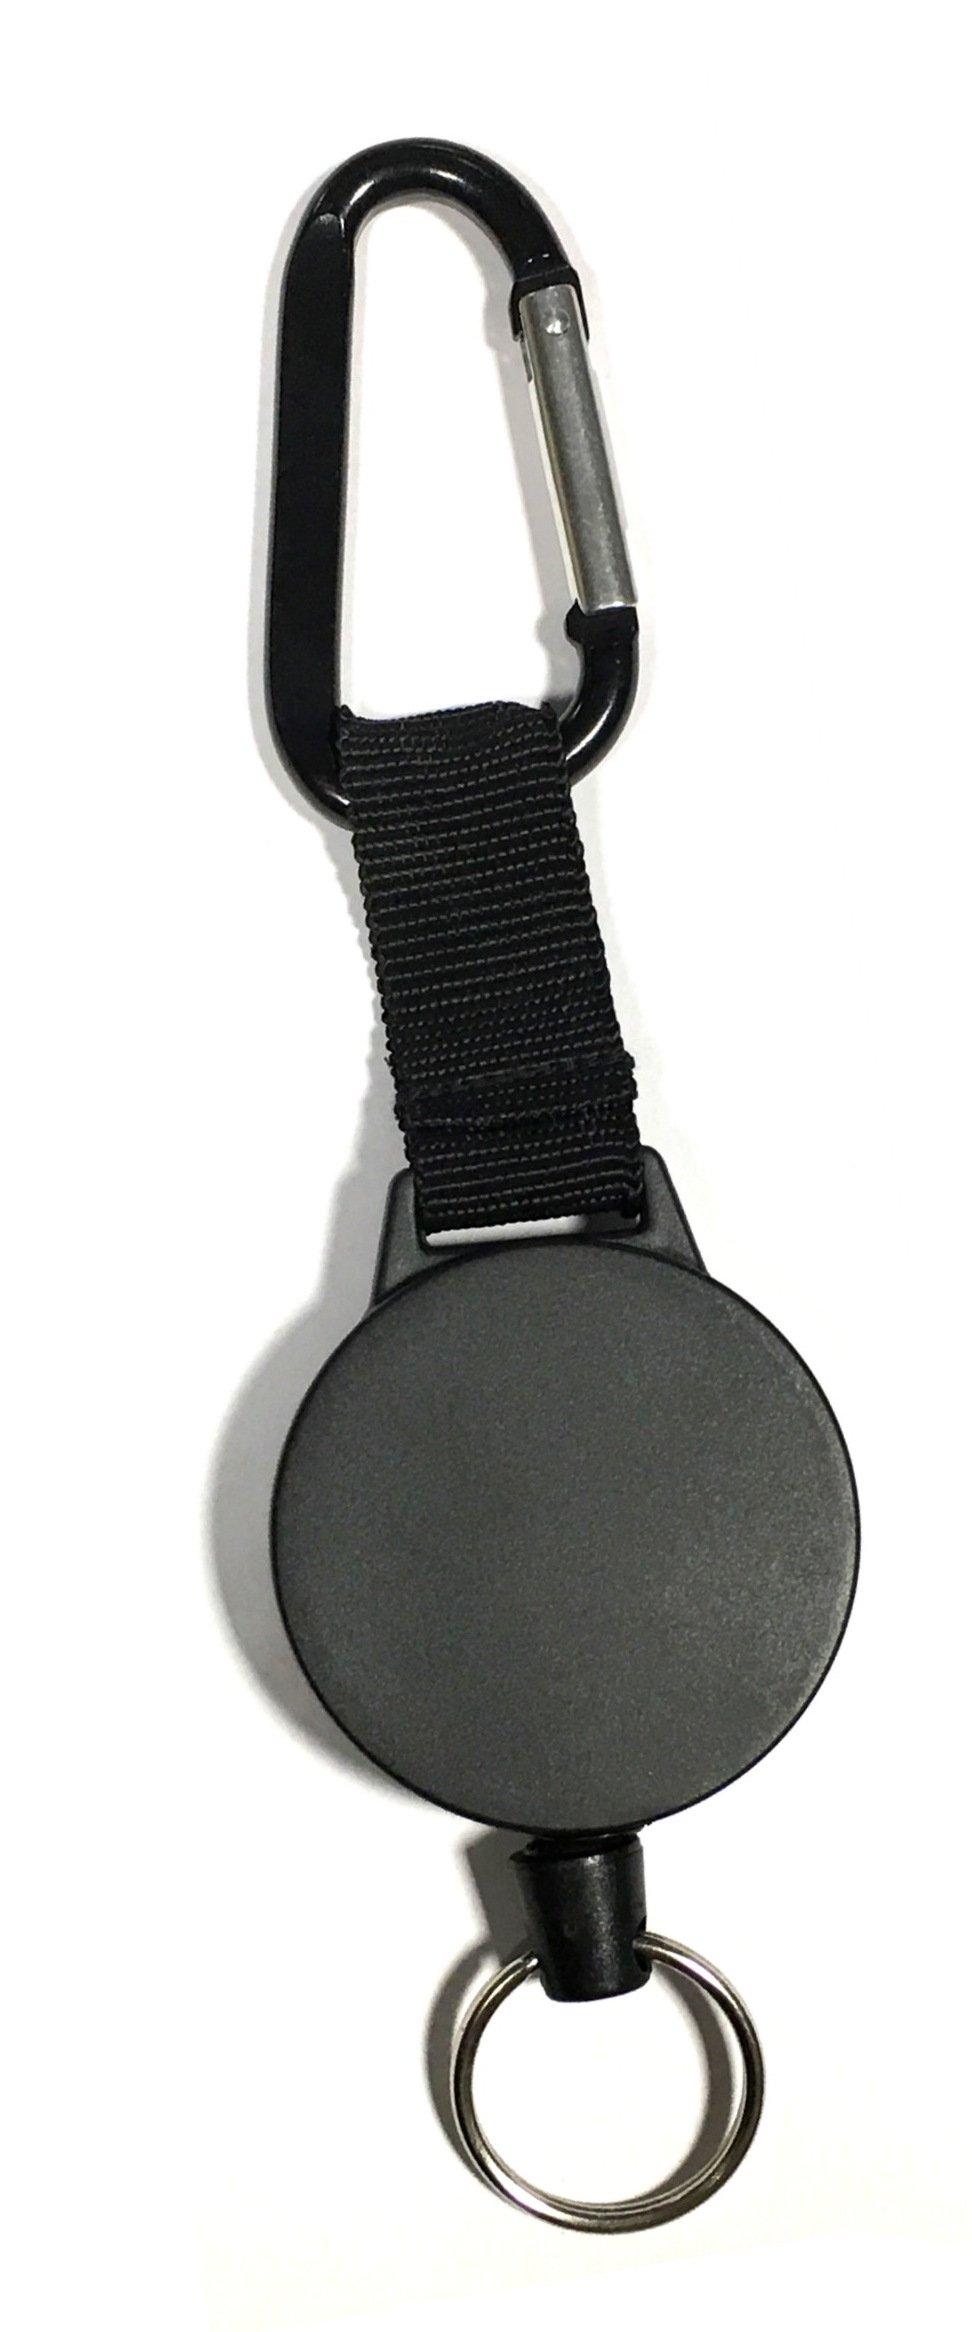 Swivel JE 9H 1pc Retractable Key Chain /& Badge Reel Holder Carabiner Clip